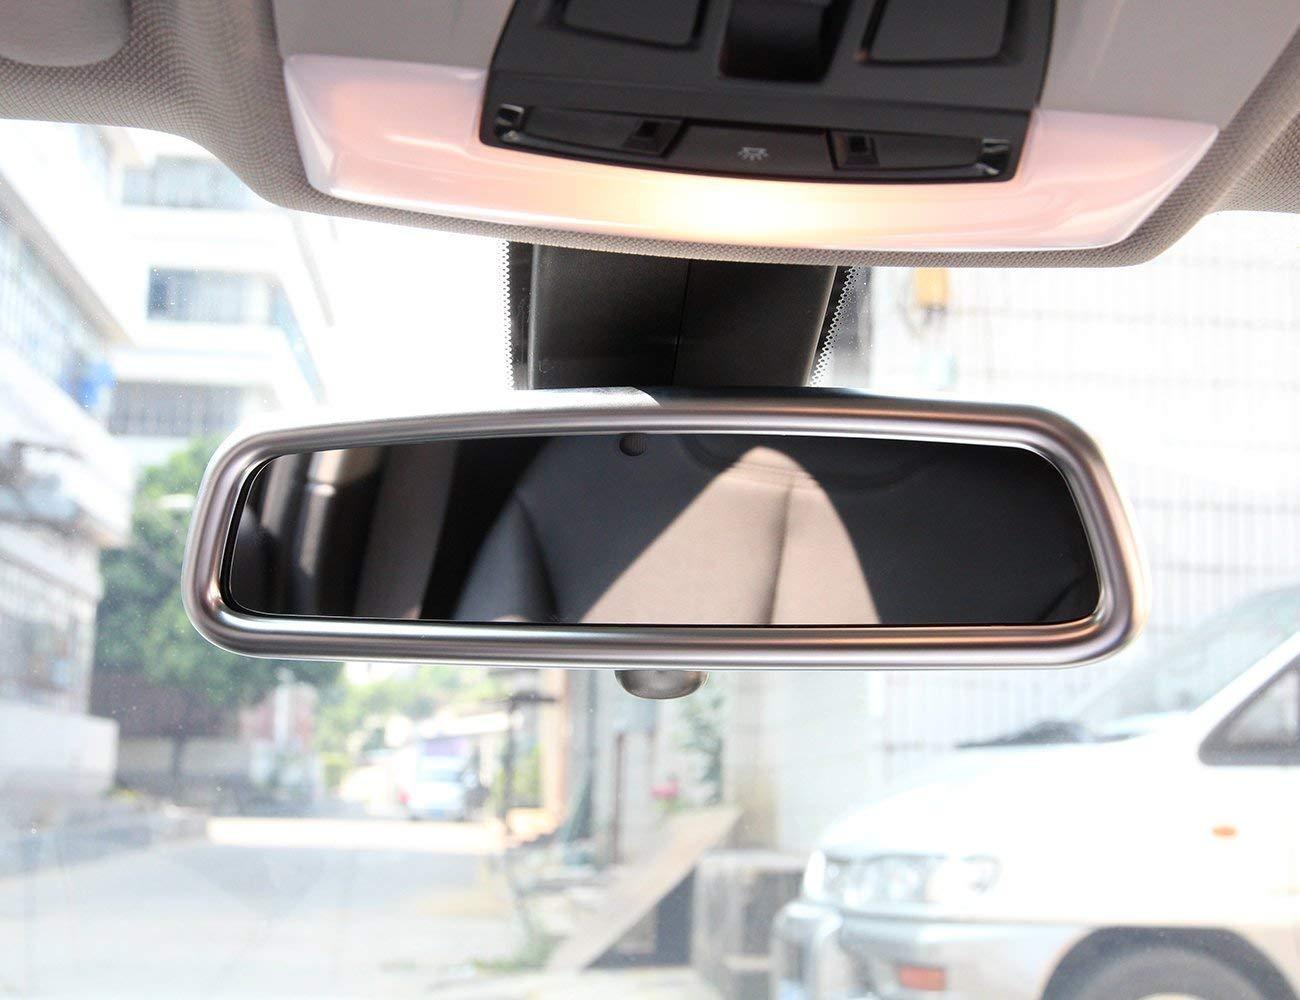 Top-Auto ABS Cubierta de Espejo retrovisor Interior cromada para BMW 3 4 Series X3 X5 X6 F15 F16 F25 F30 F31 F34 F32 F33 F36 F70